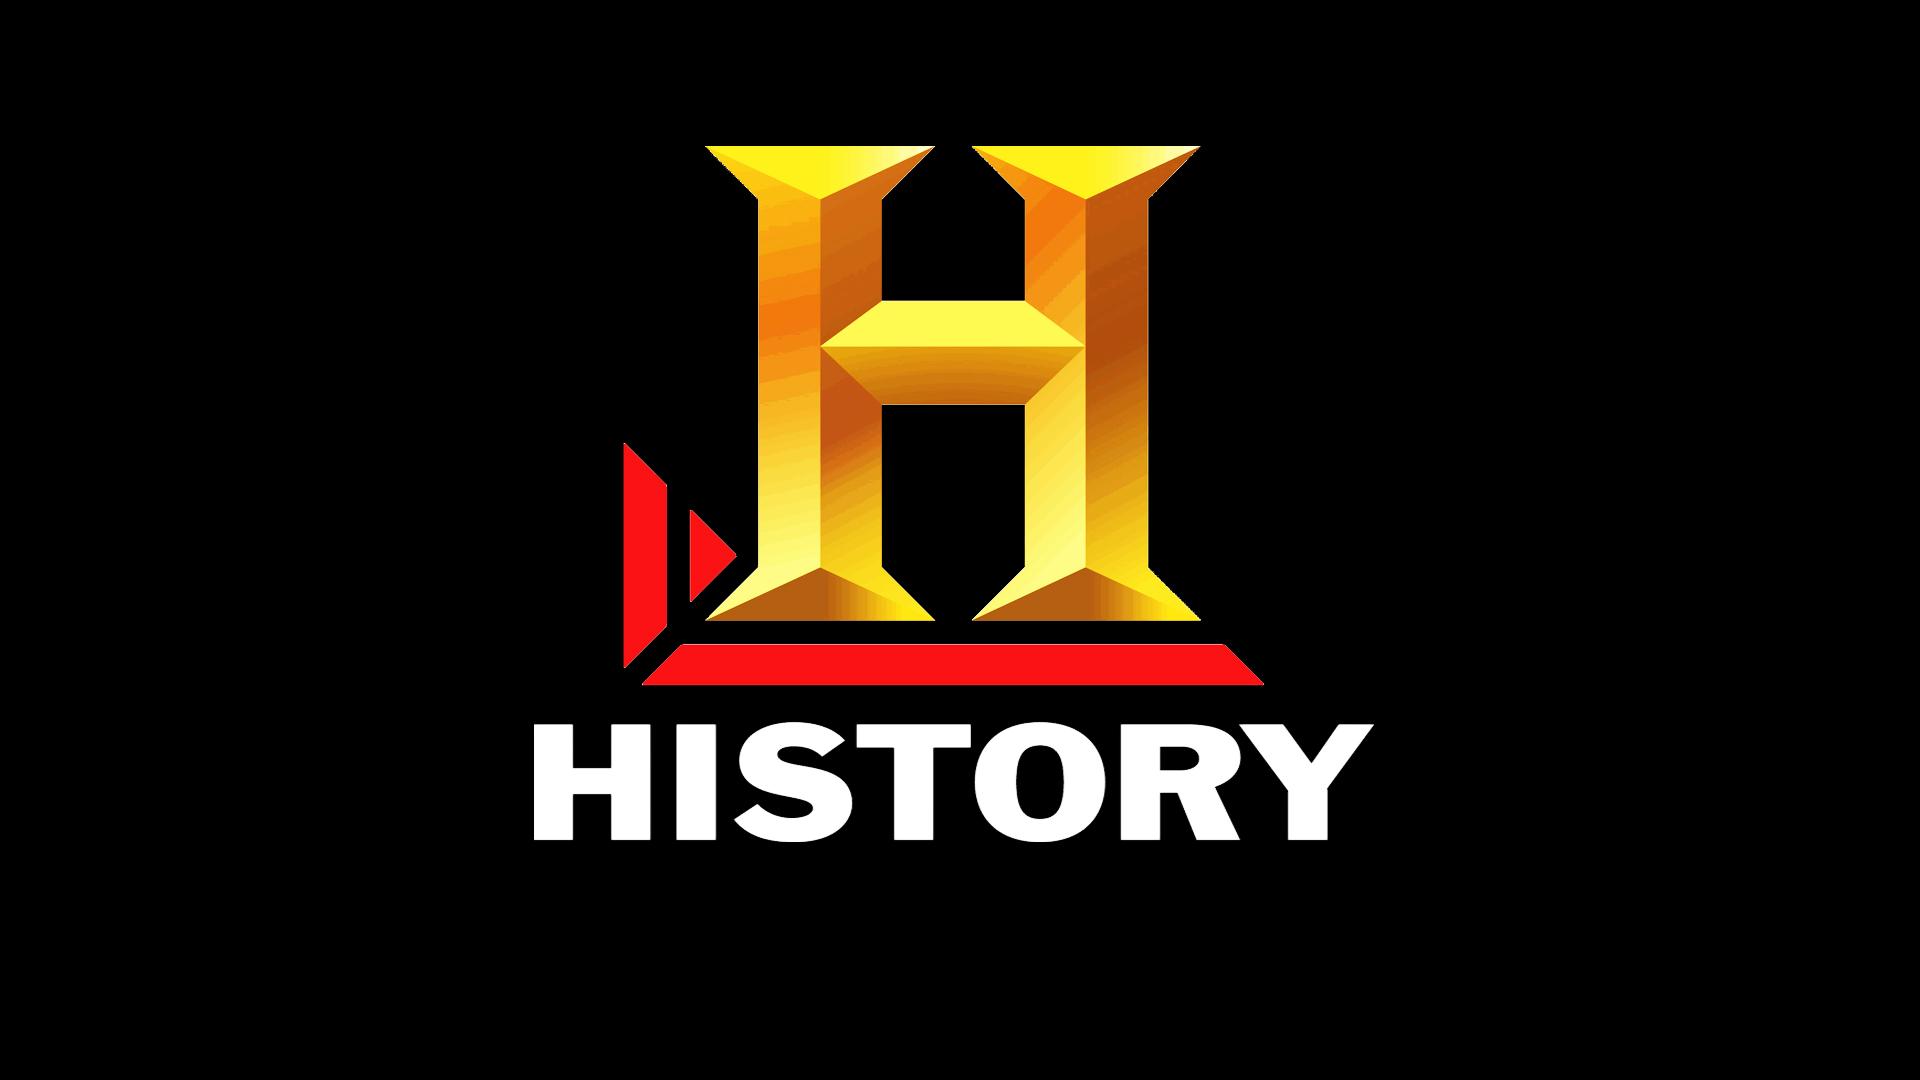 Hd Wallpapers History Channel Vikings Tv Show 1600 X 900 165 Kb Jpeg 1920x1080